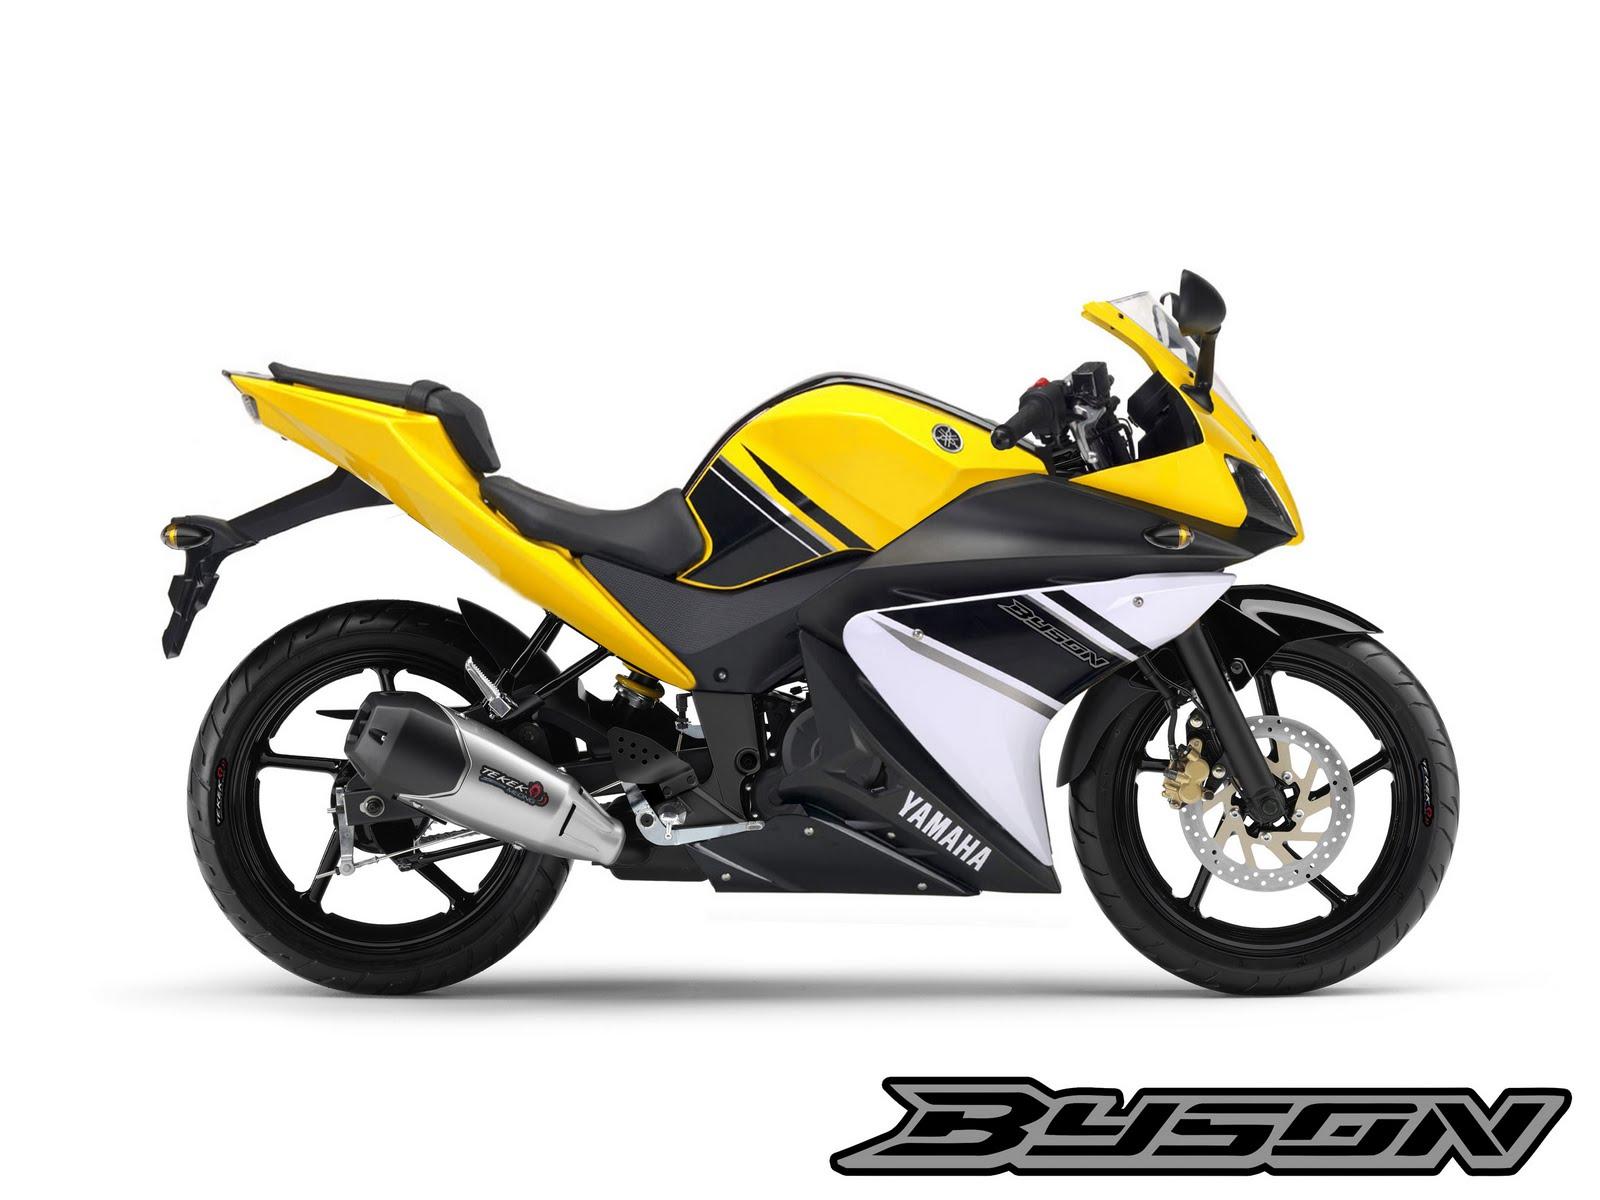 Modifikasi Motor Yamaha 2016 Modif Yamaha Bison Terbaru